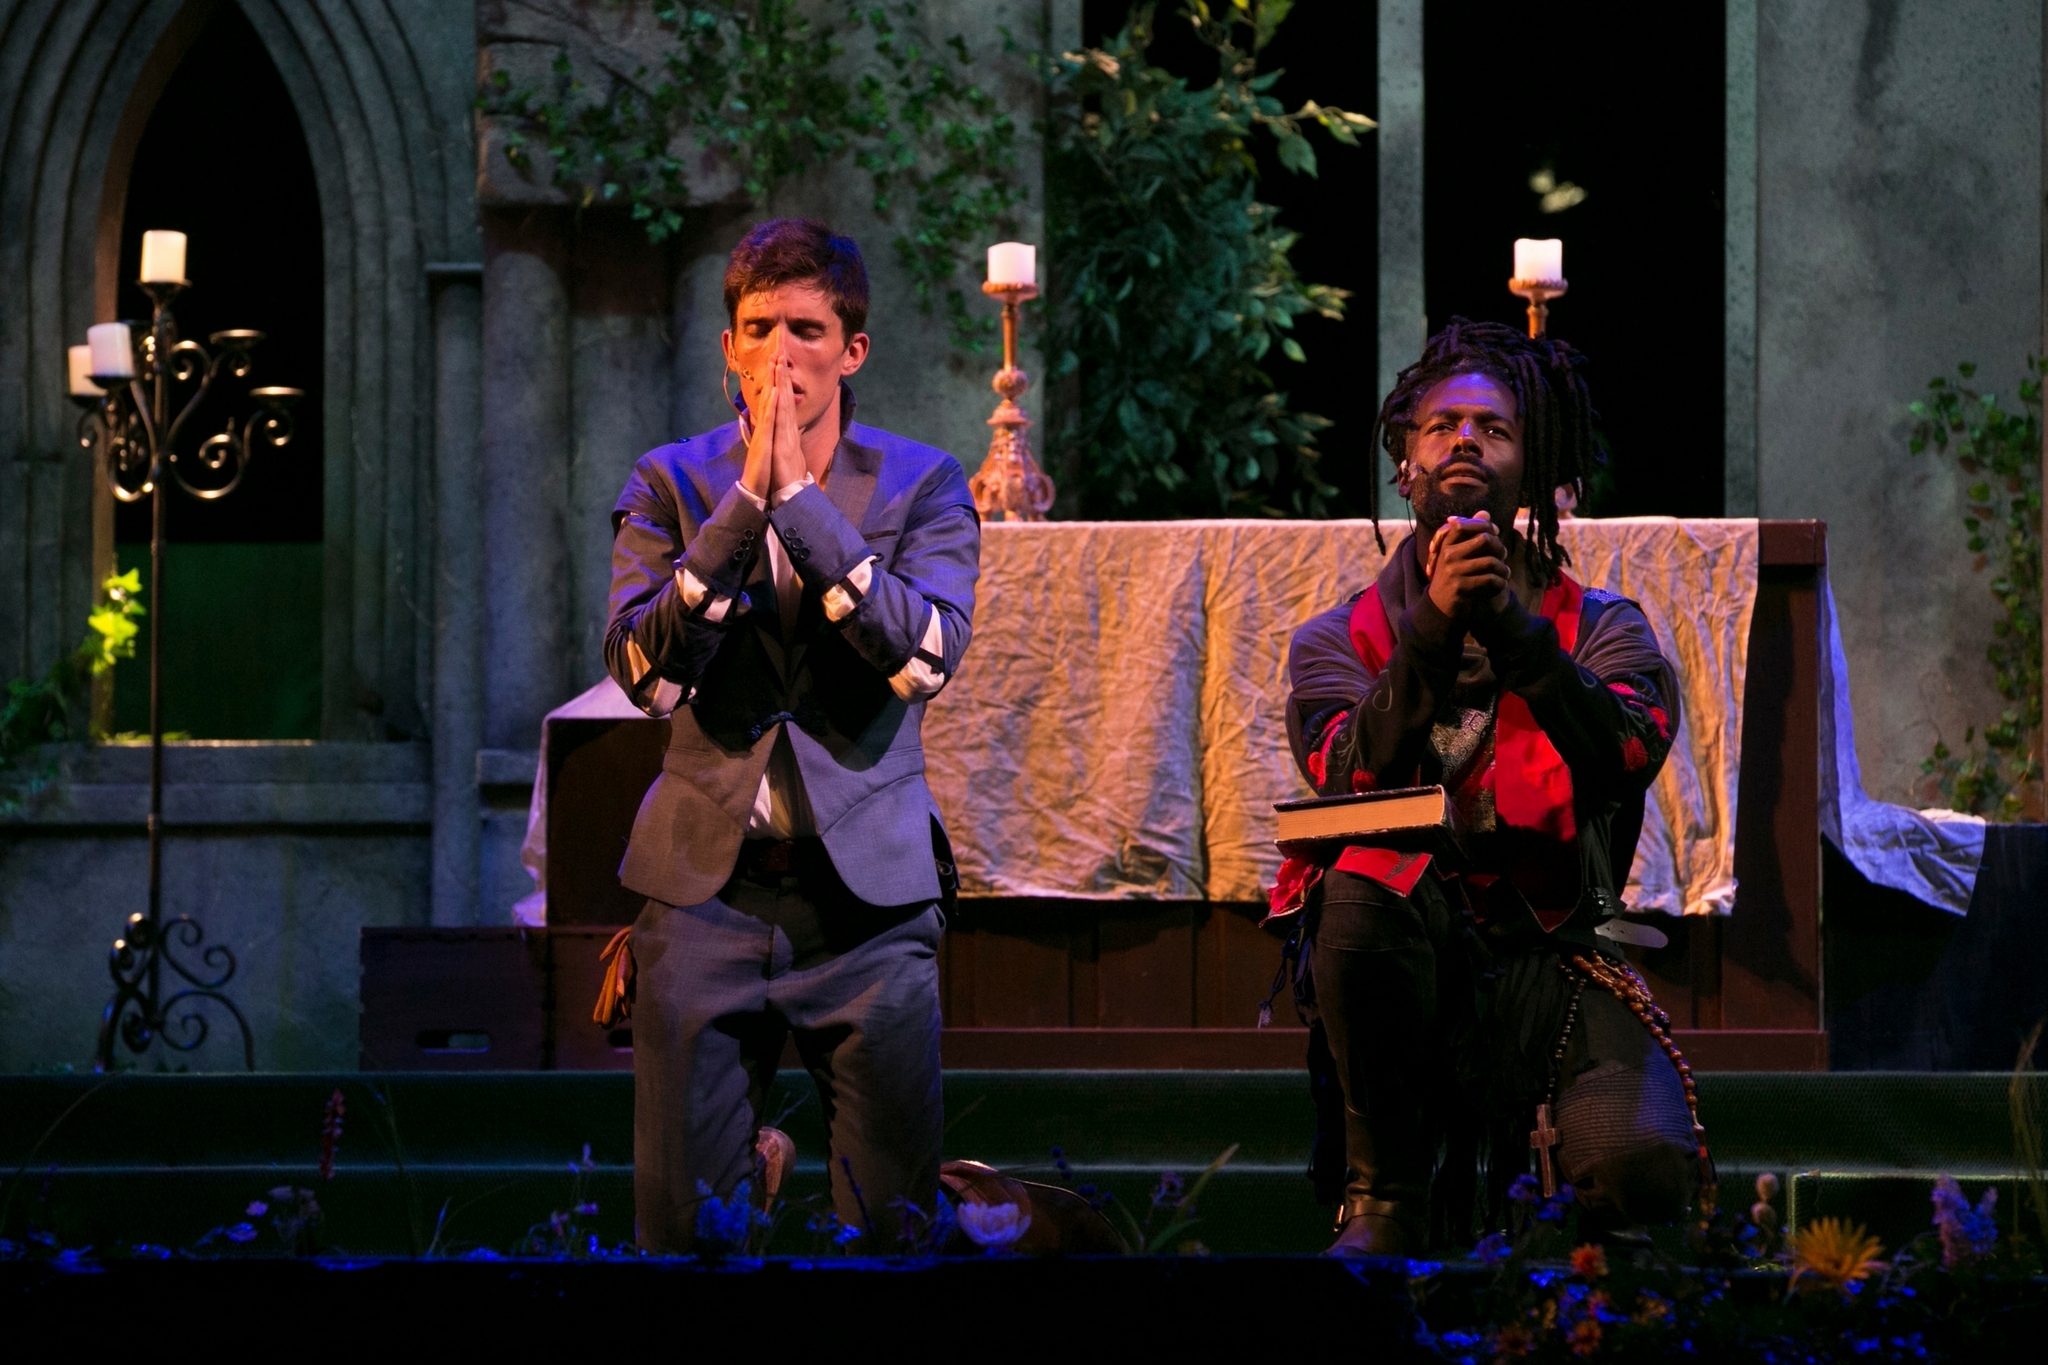 John Zdrojeski (Romeo) and Equiano Mosieri (Friar Laurence) in Romeo & Juliet, Shakespeare on the Common 2017-Photo by Evgenia Eliseeva